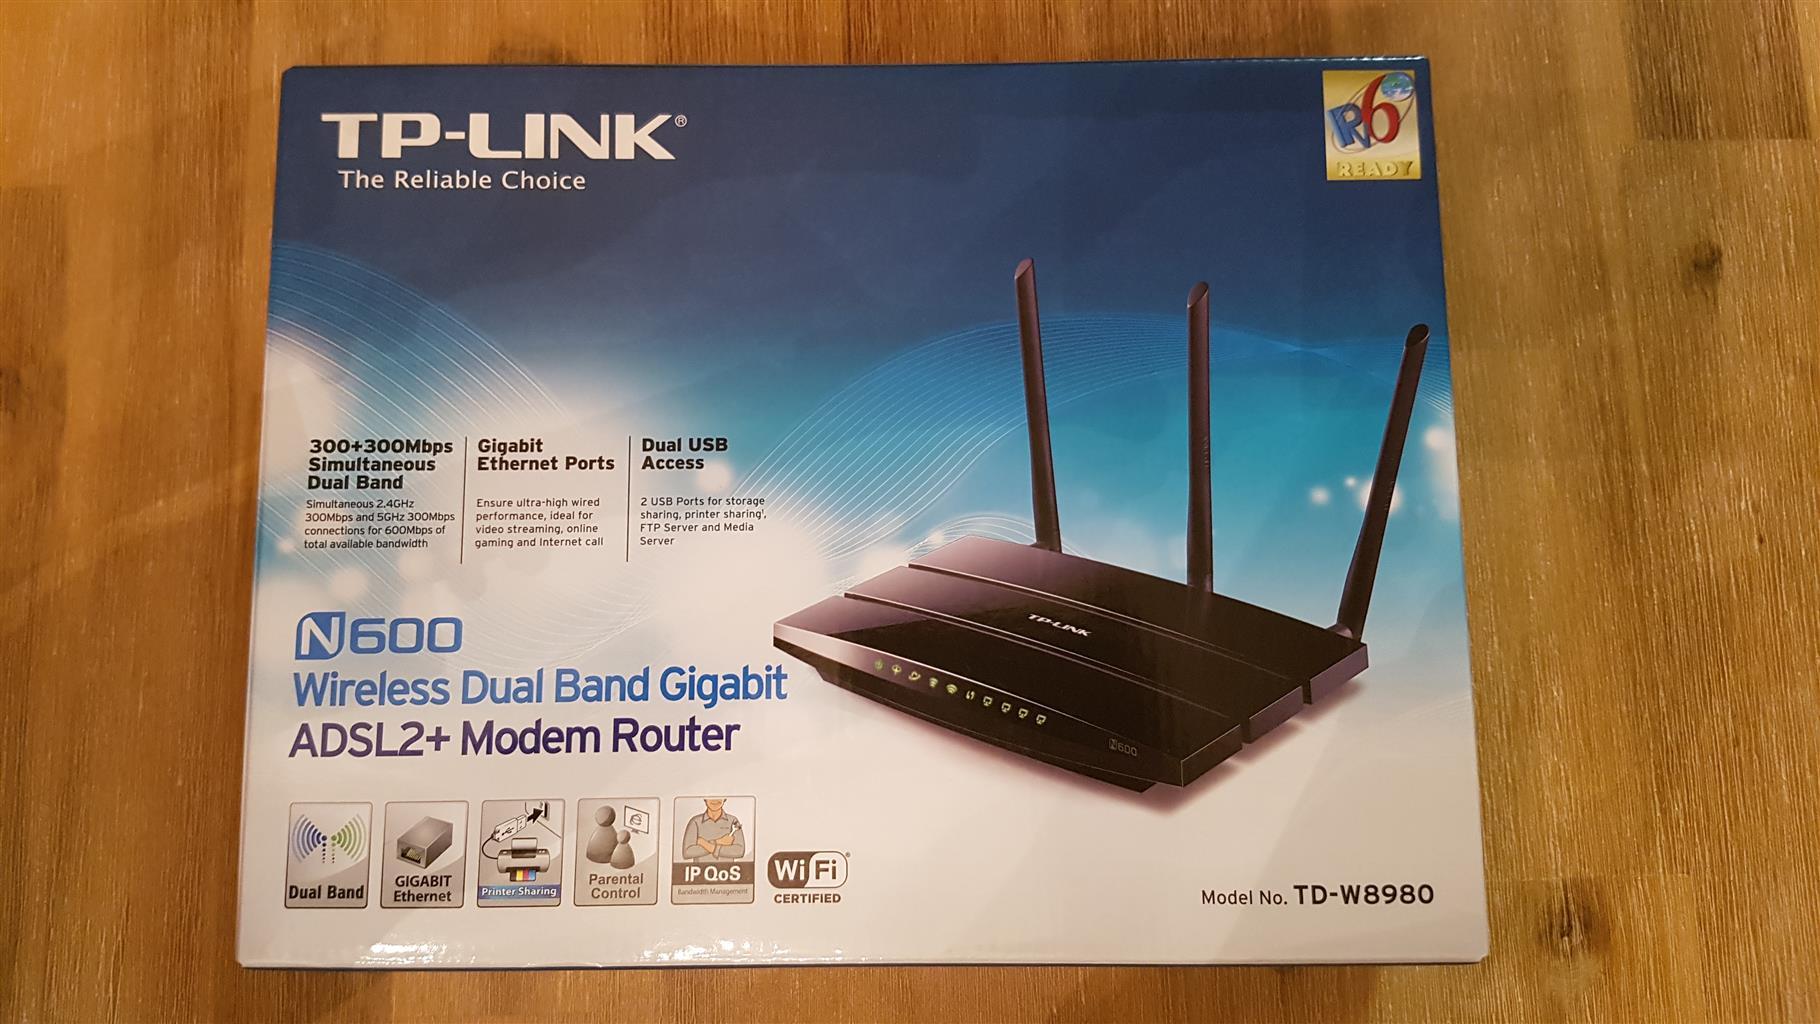 TP-Link N600 TD-W8980 Wireless Dual Band Gigabit ADSL2+ Modem Router ...